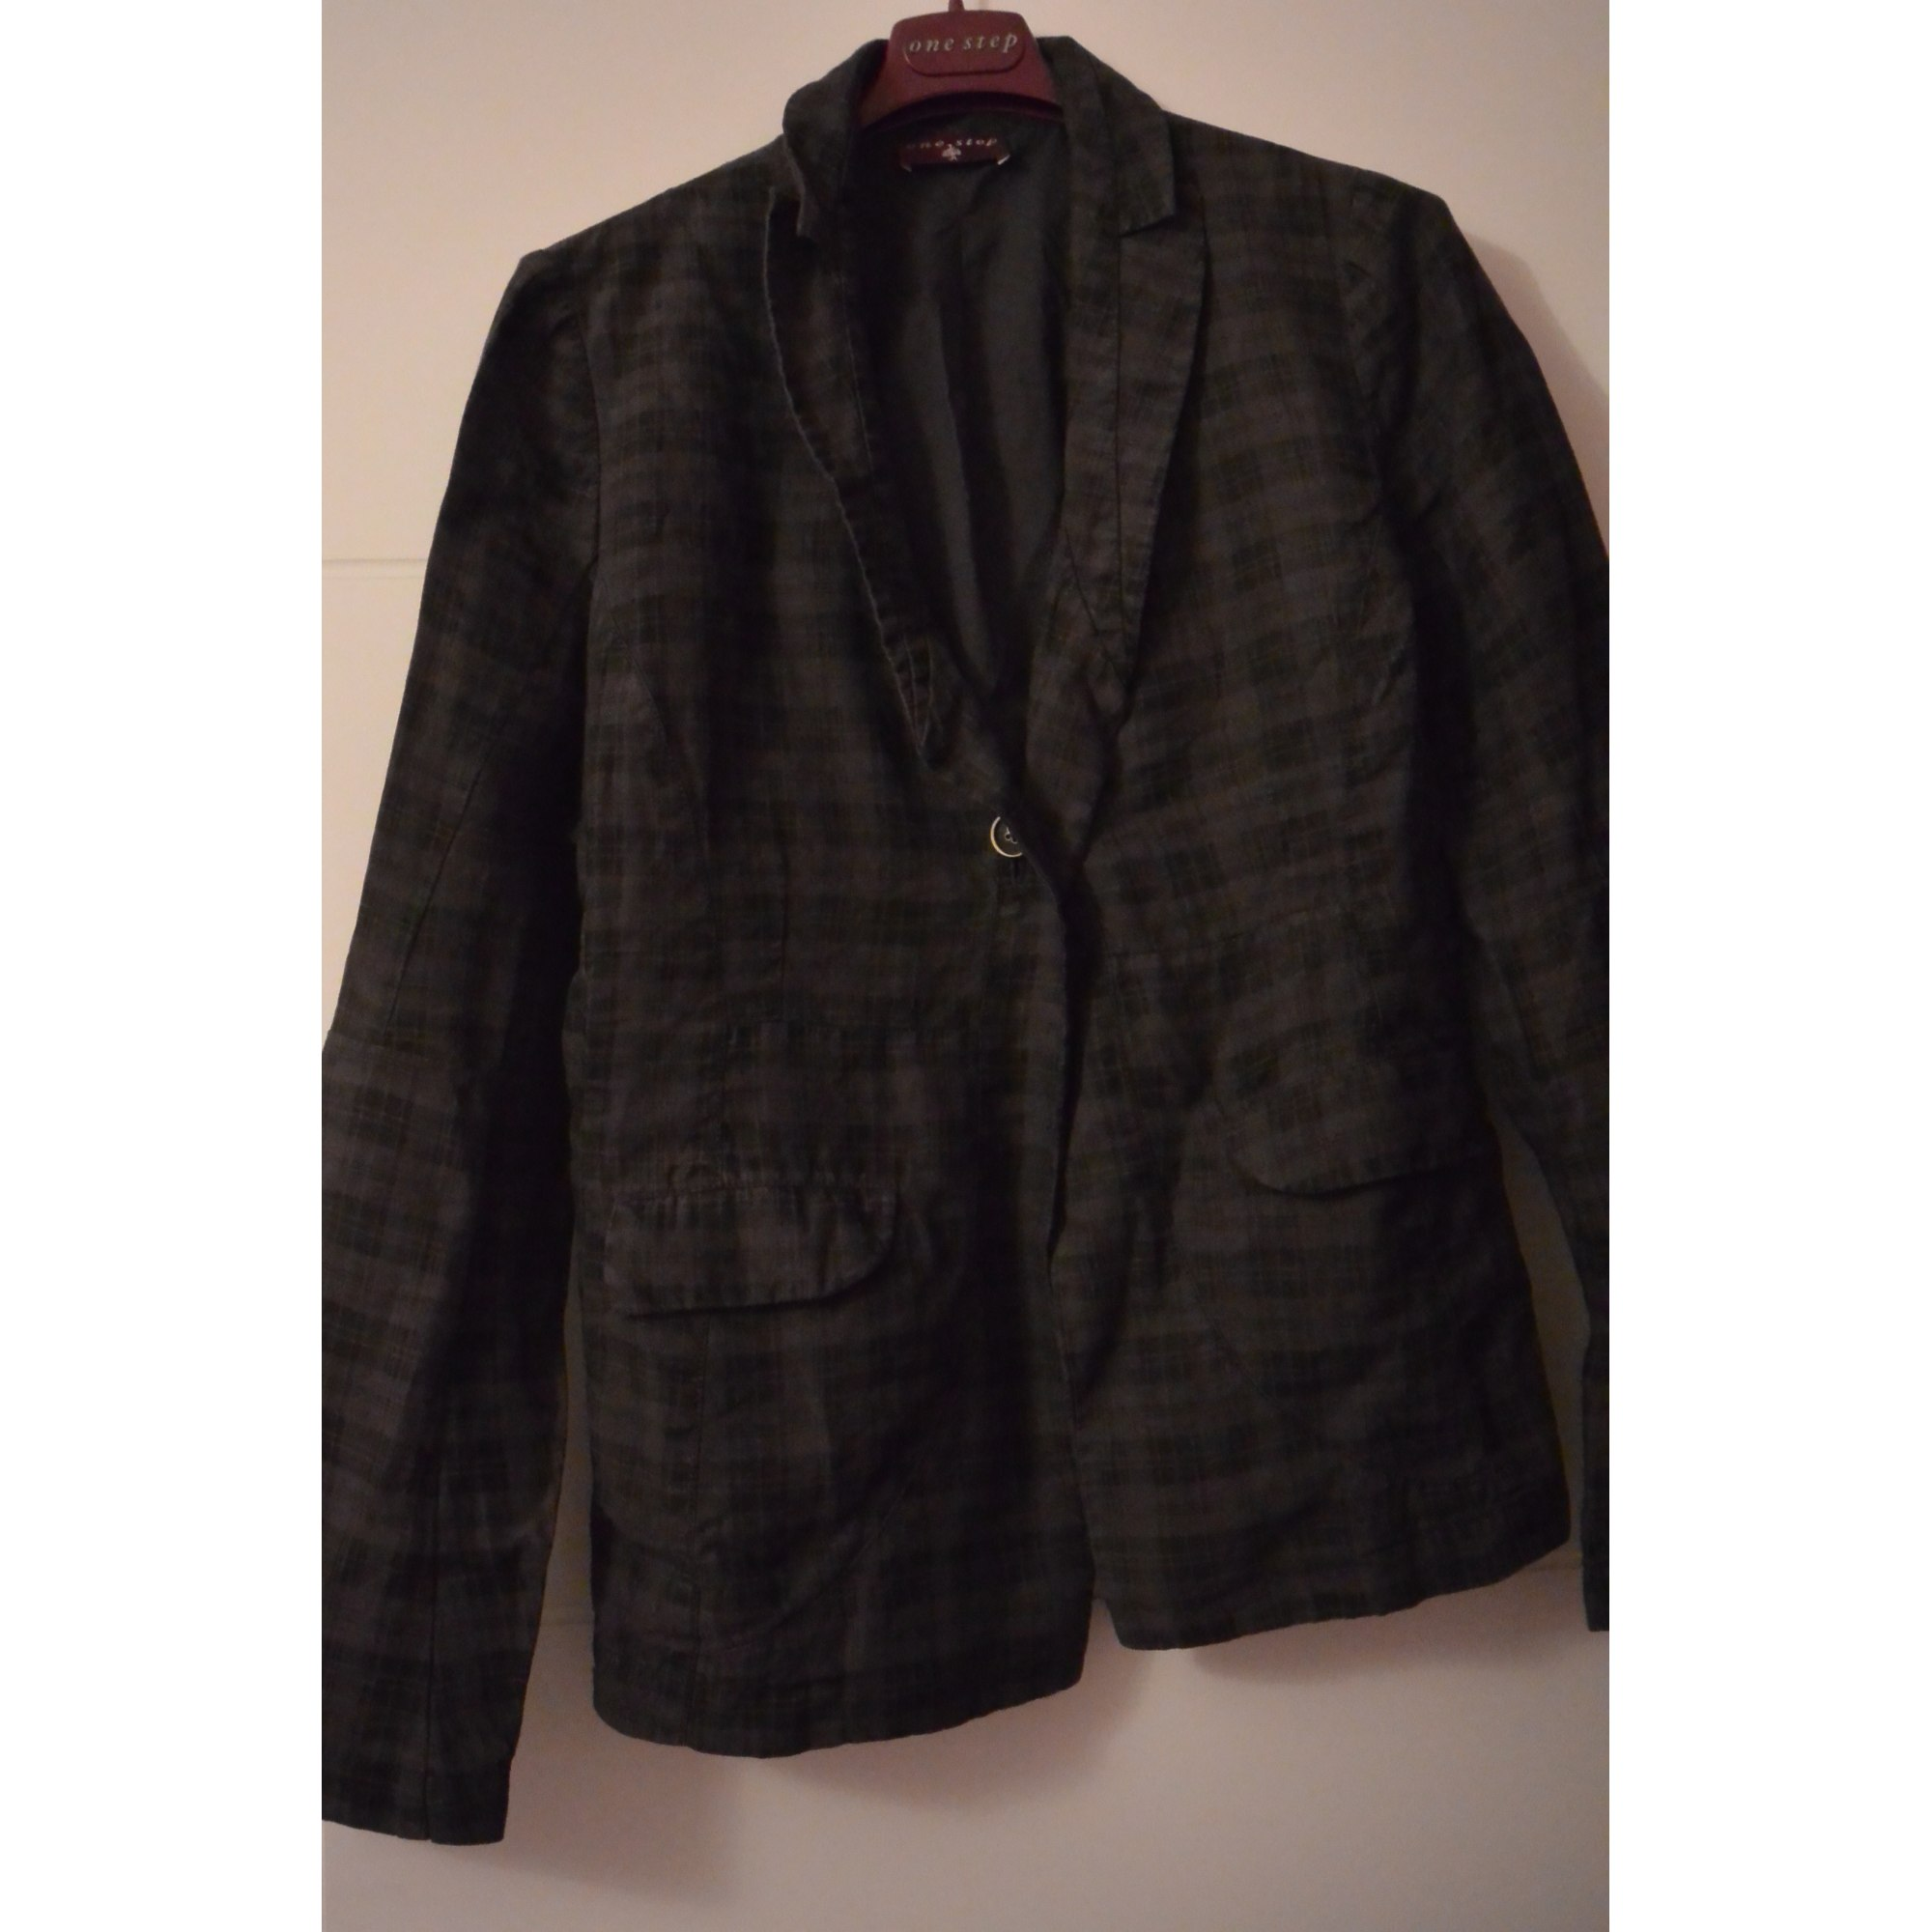 Blazer, veste tailleur ONE STEP Violet, mauve, lavande